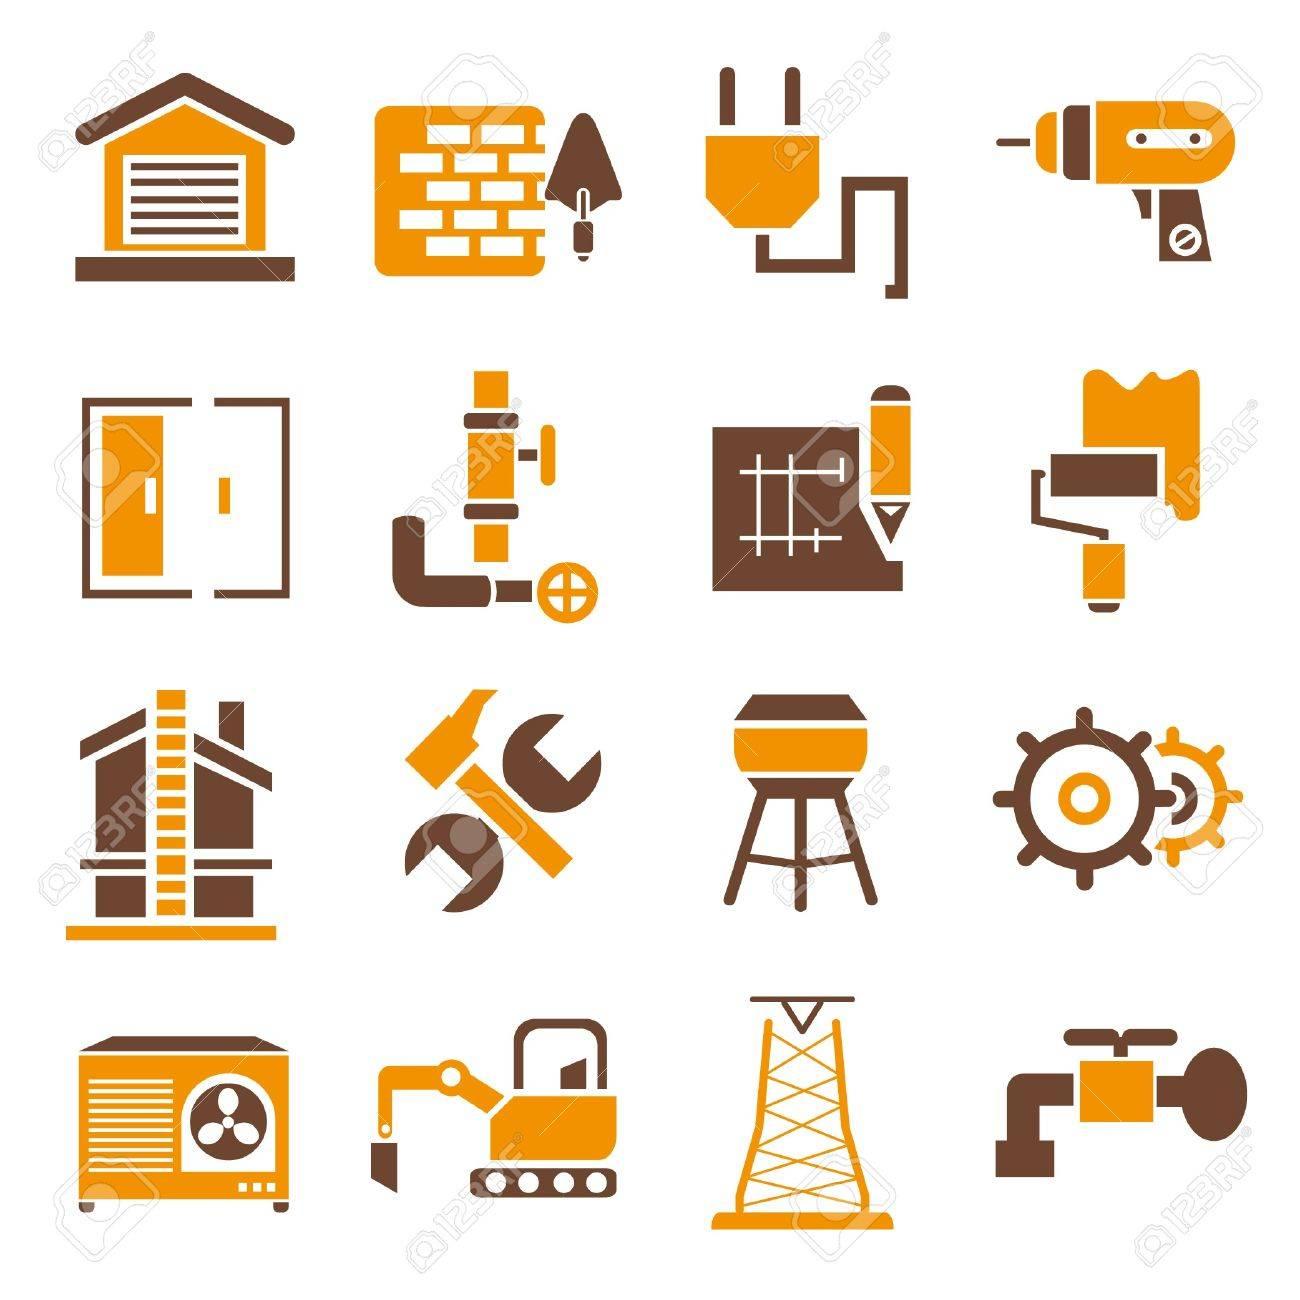 construction icons, icons set, orange theme Stock Vector - 21506619